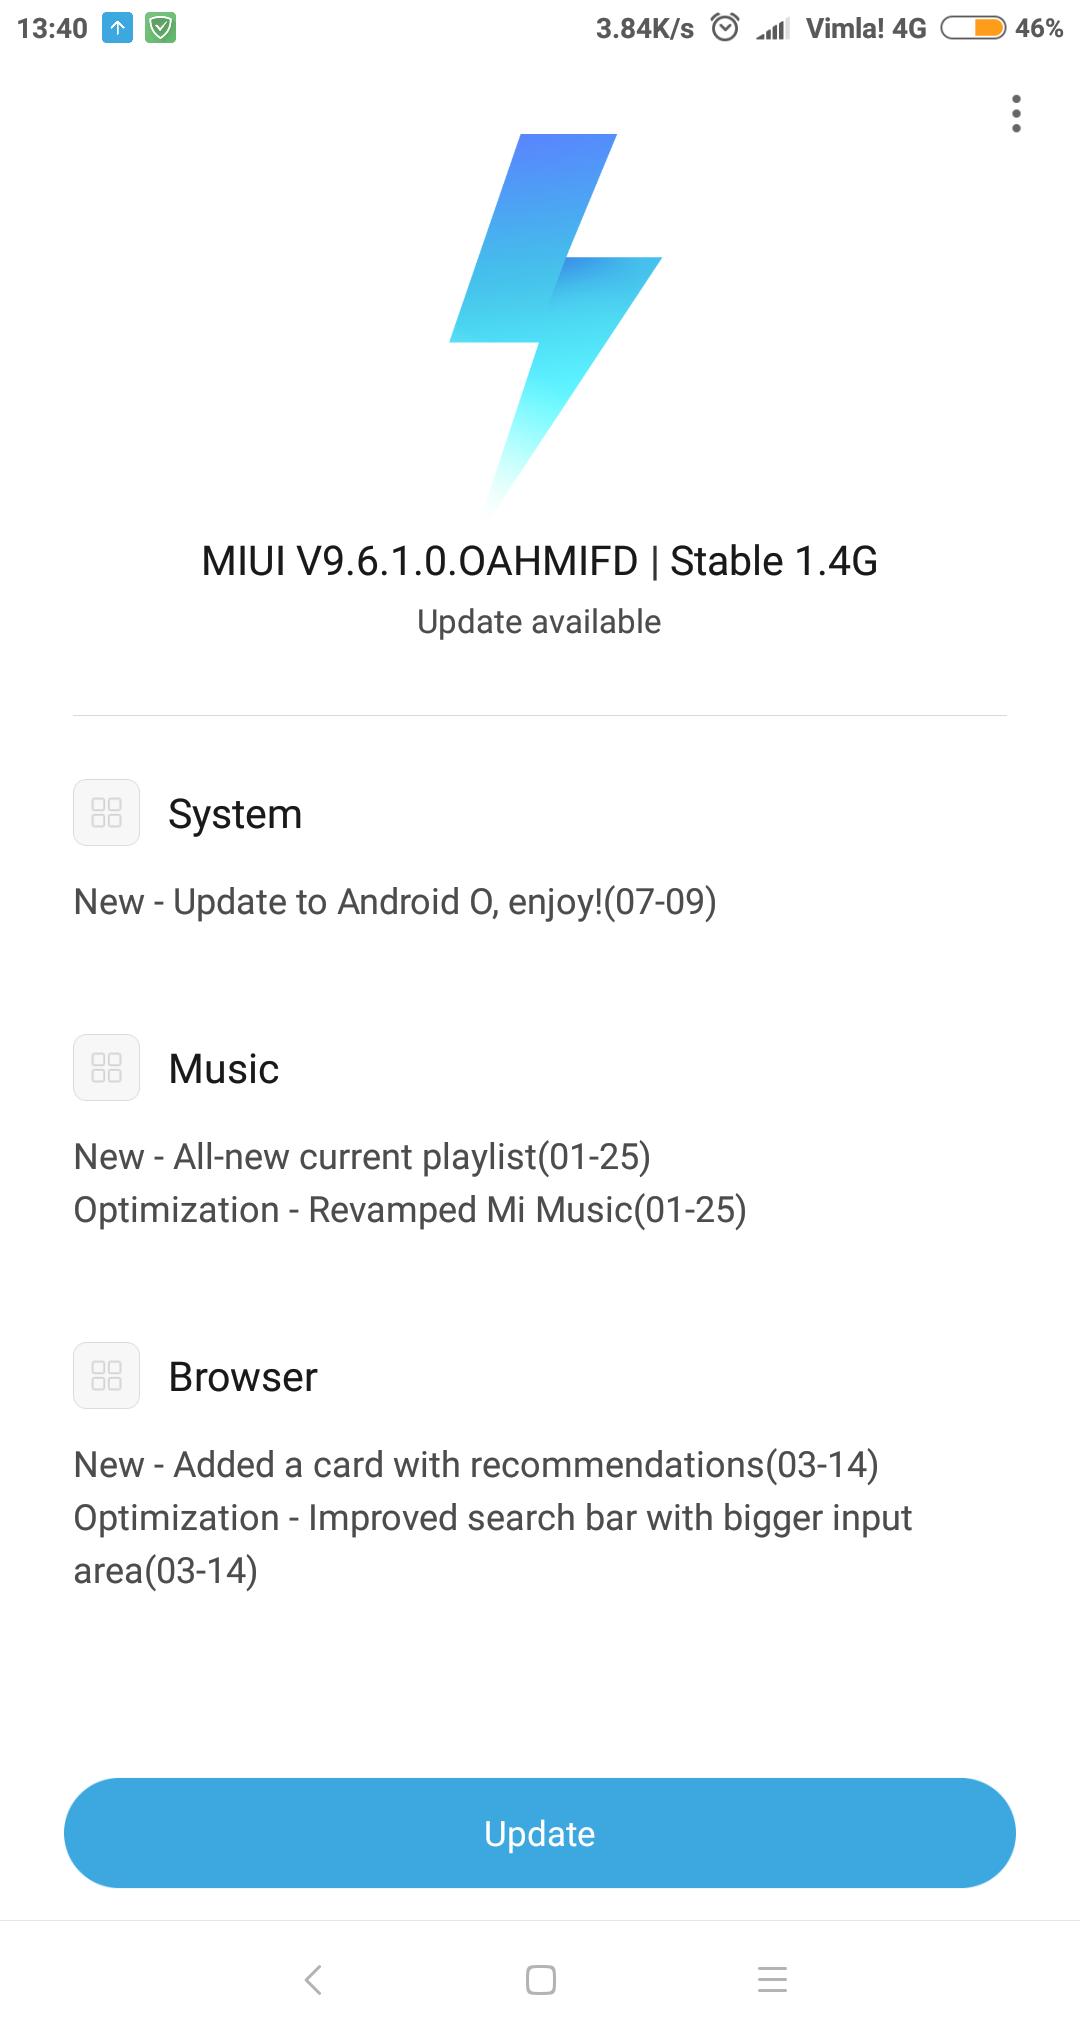 Screenshot_2018-07-12-13-40-51-924_com.android.updater.png